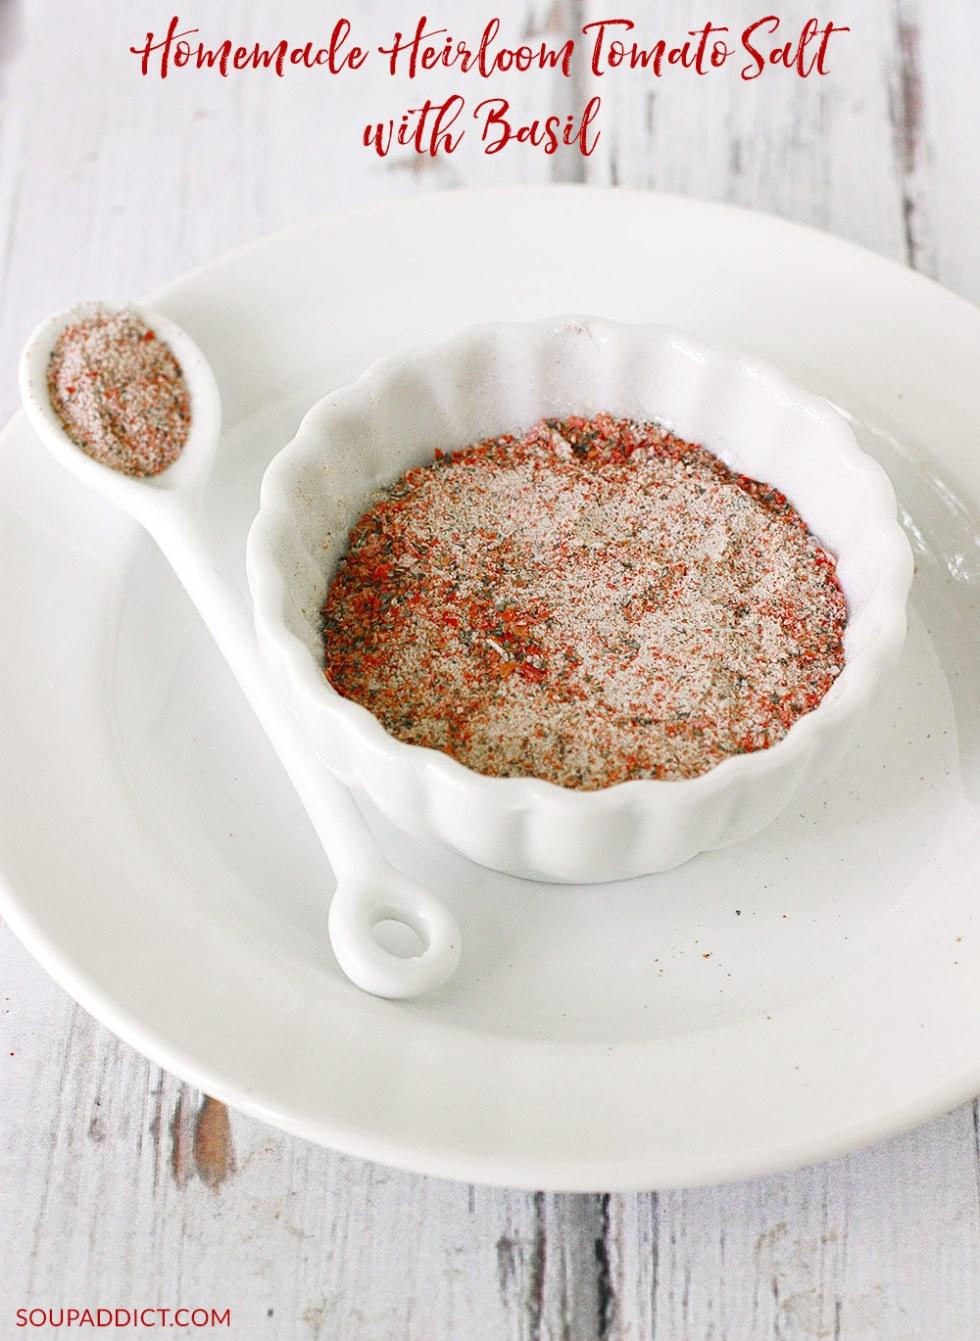 Homemade Heirloom Tomato Salt with Basil | SoupAddict.com